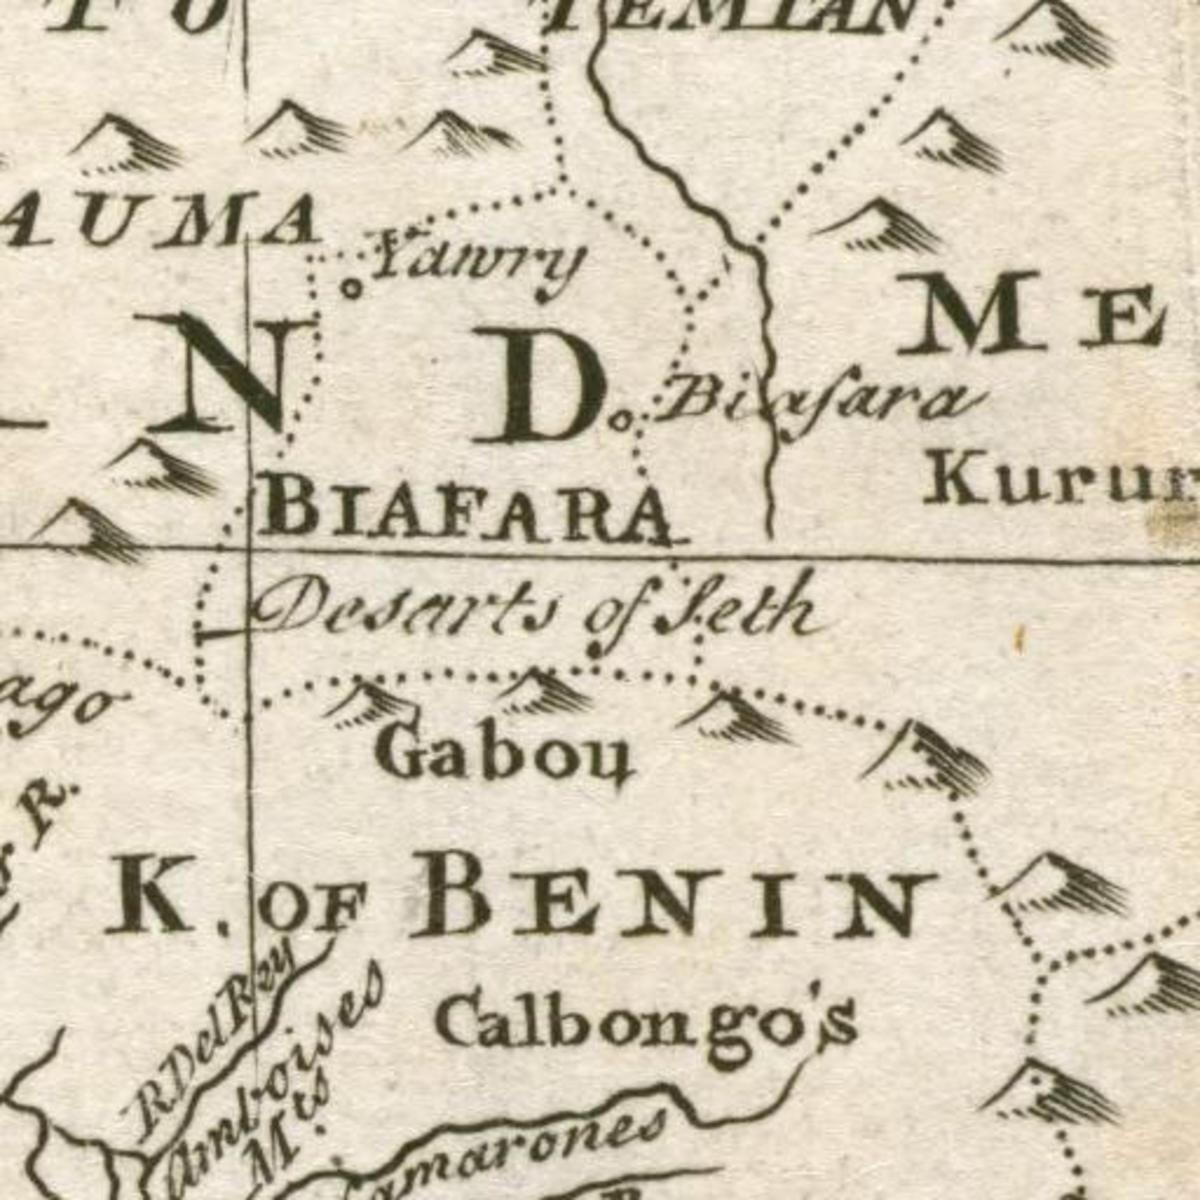 Deserts of Seth -  West Africa 1747